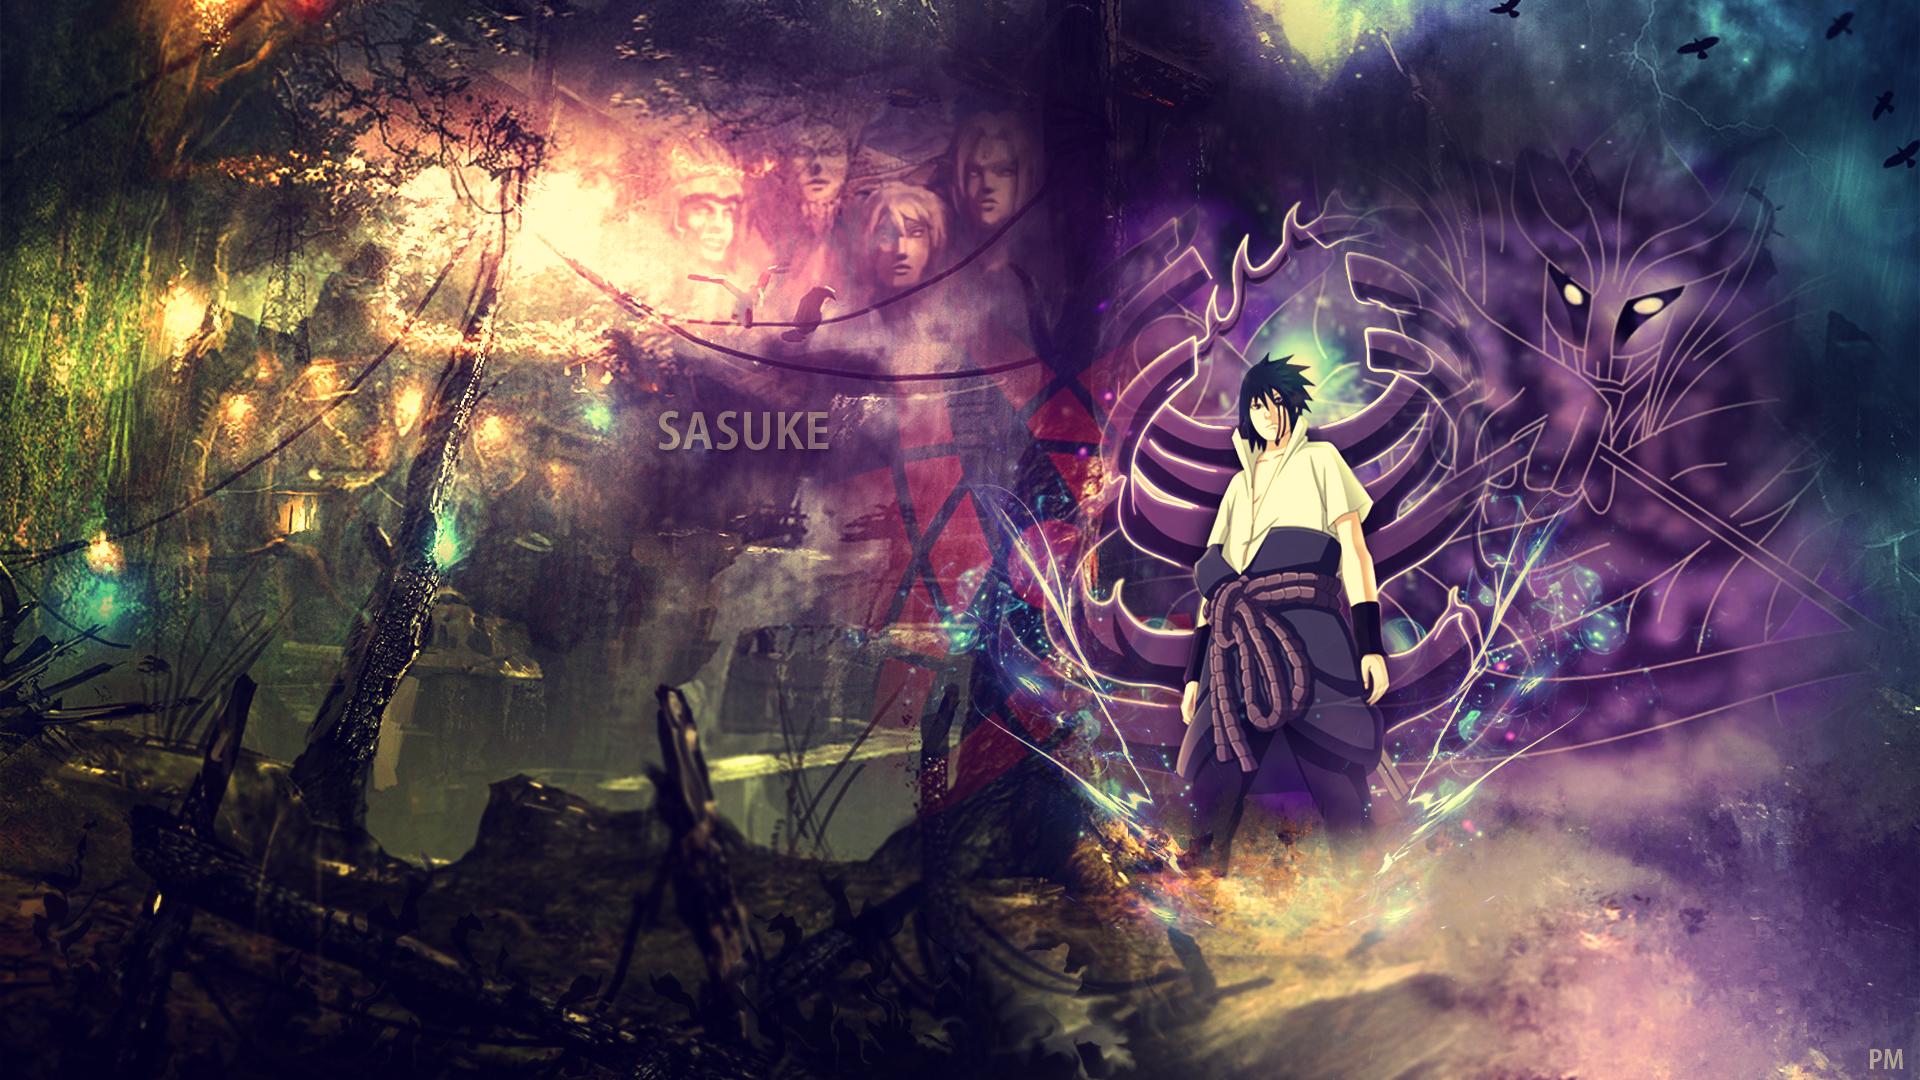 [Wallpaper] - Sasuke Uchiha by attats on DeviantArt